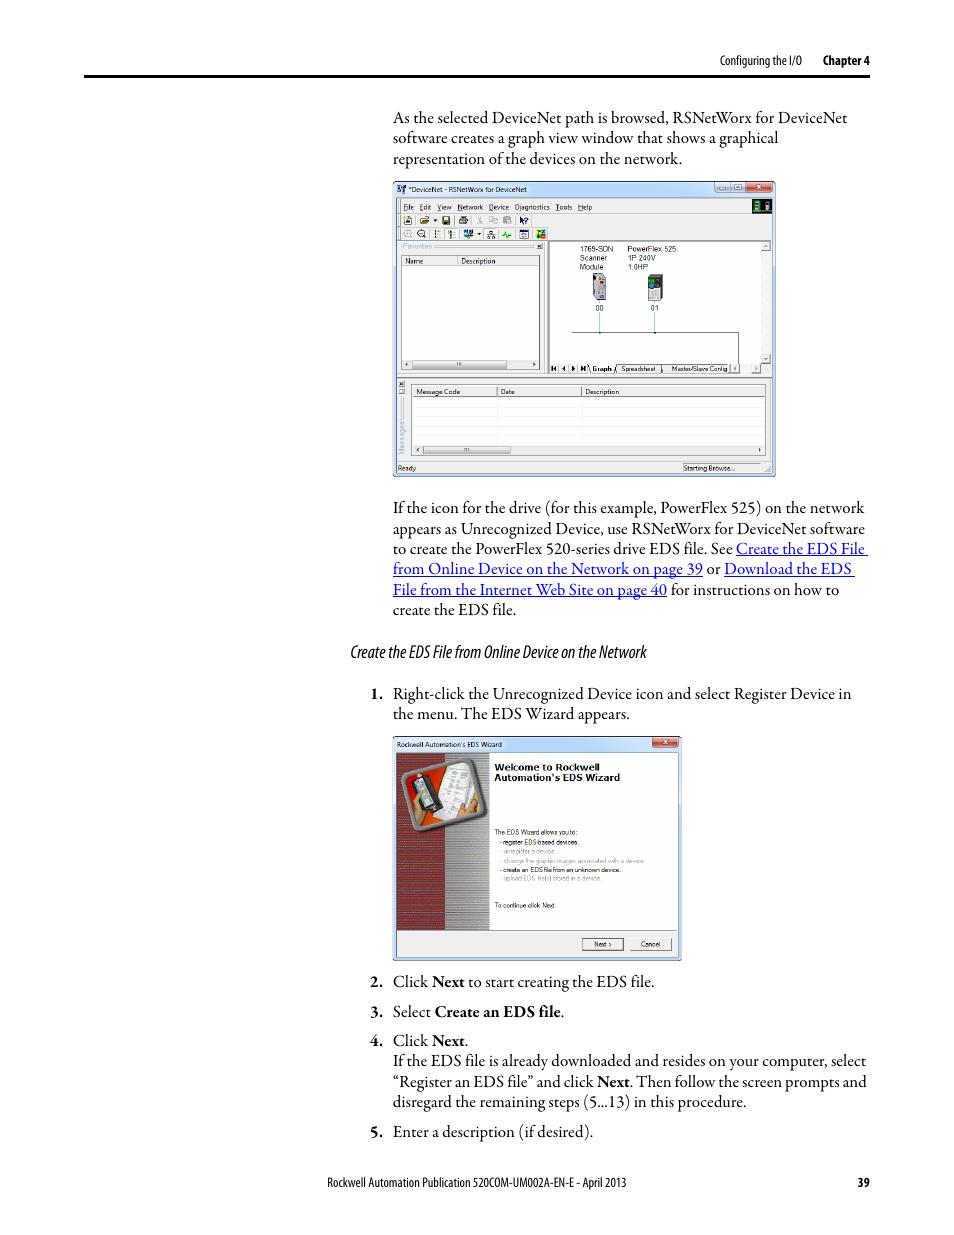 wiring diagram on a powerflex 755 – the wiring diagram, Wiring diagram